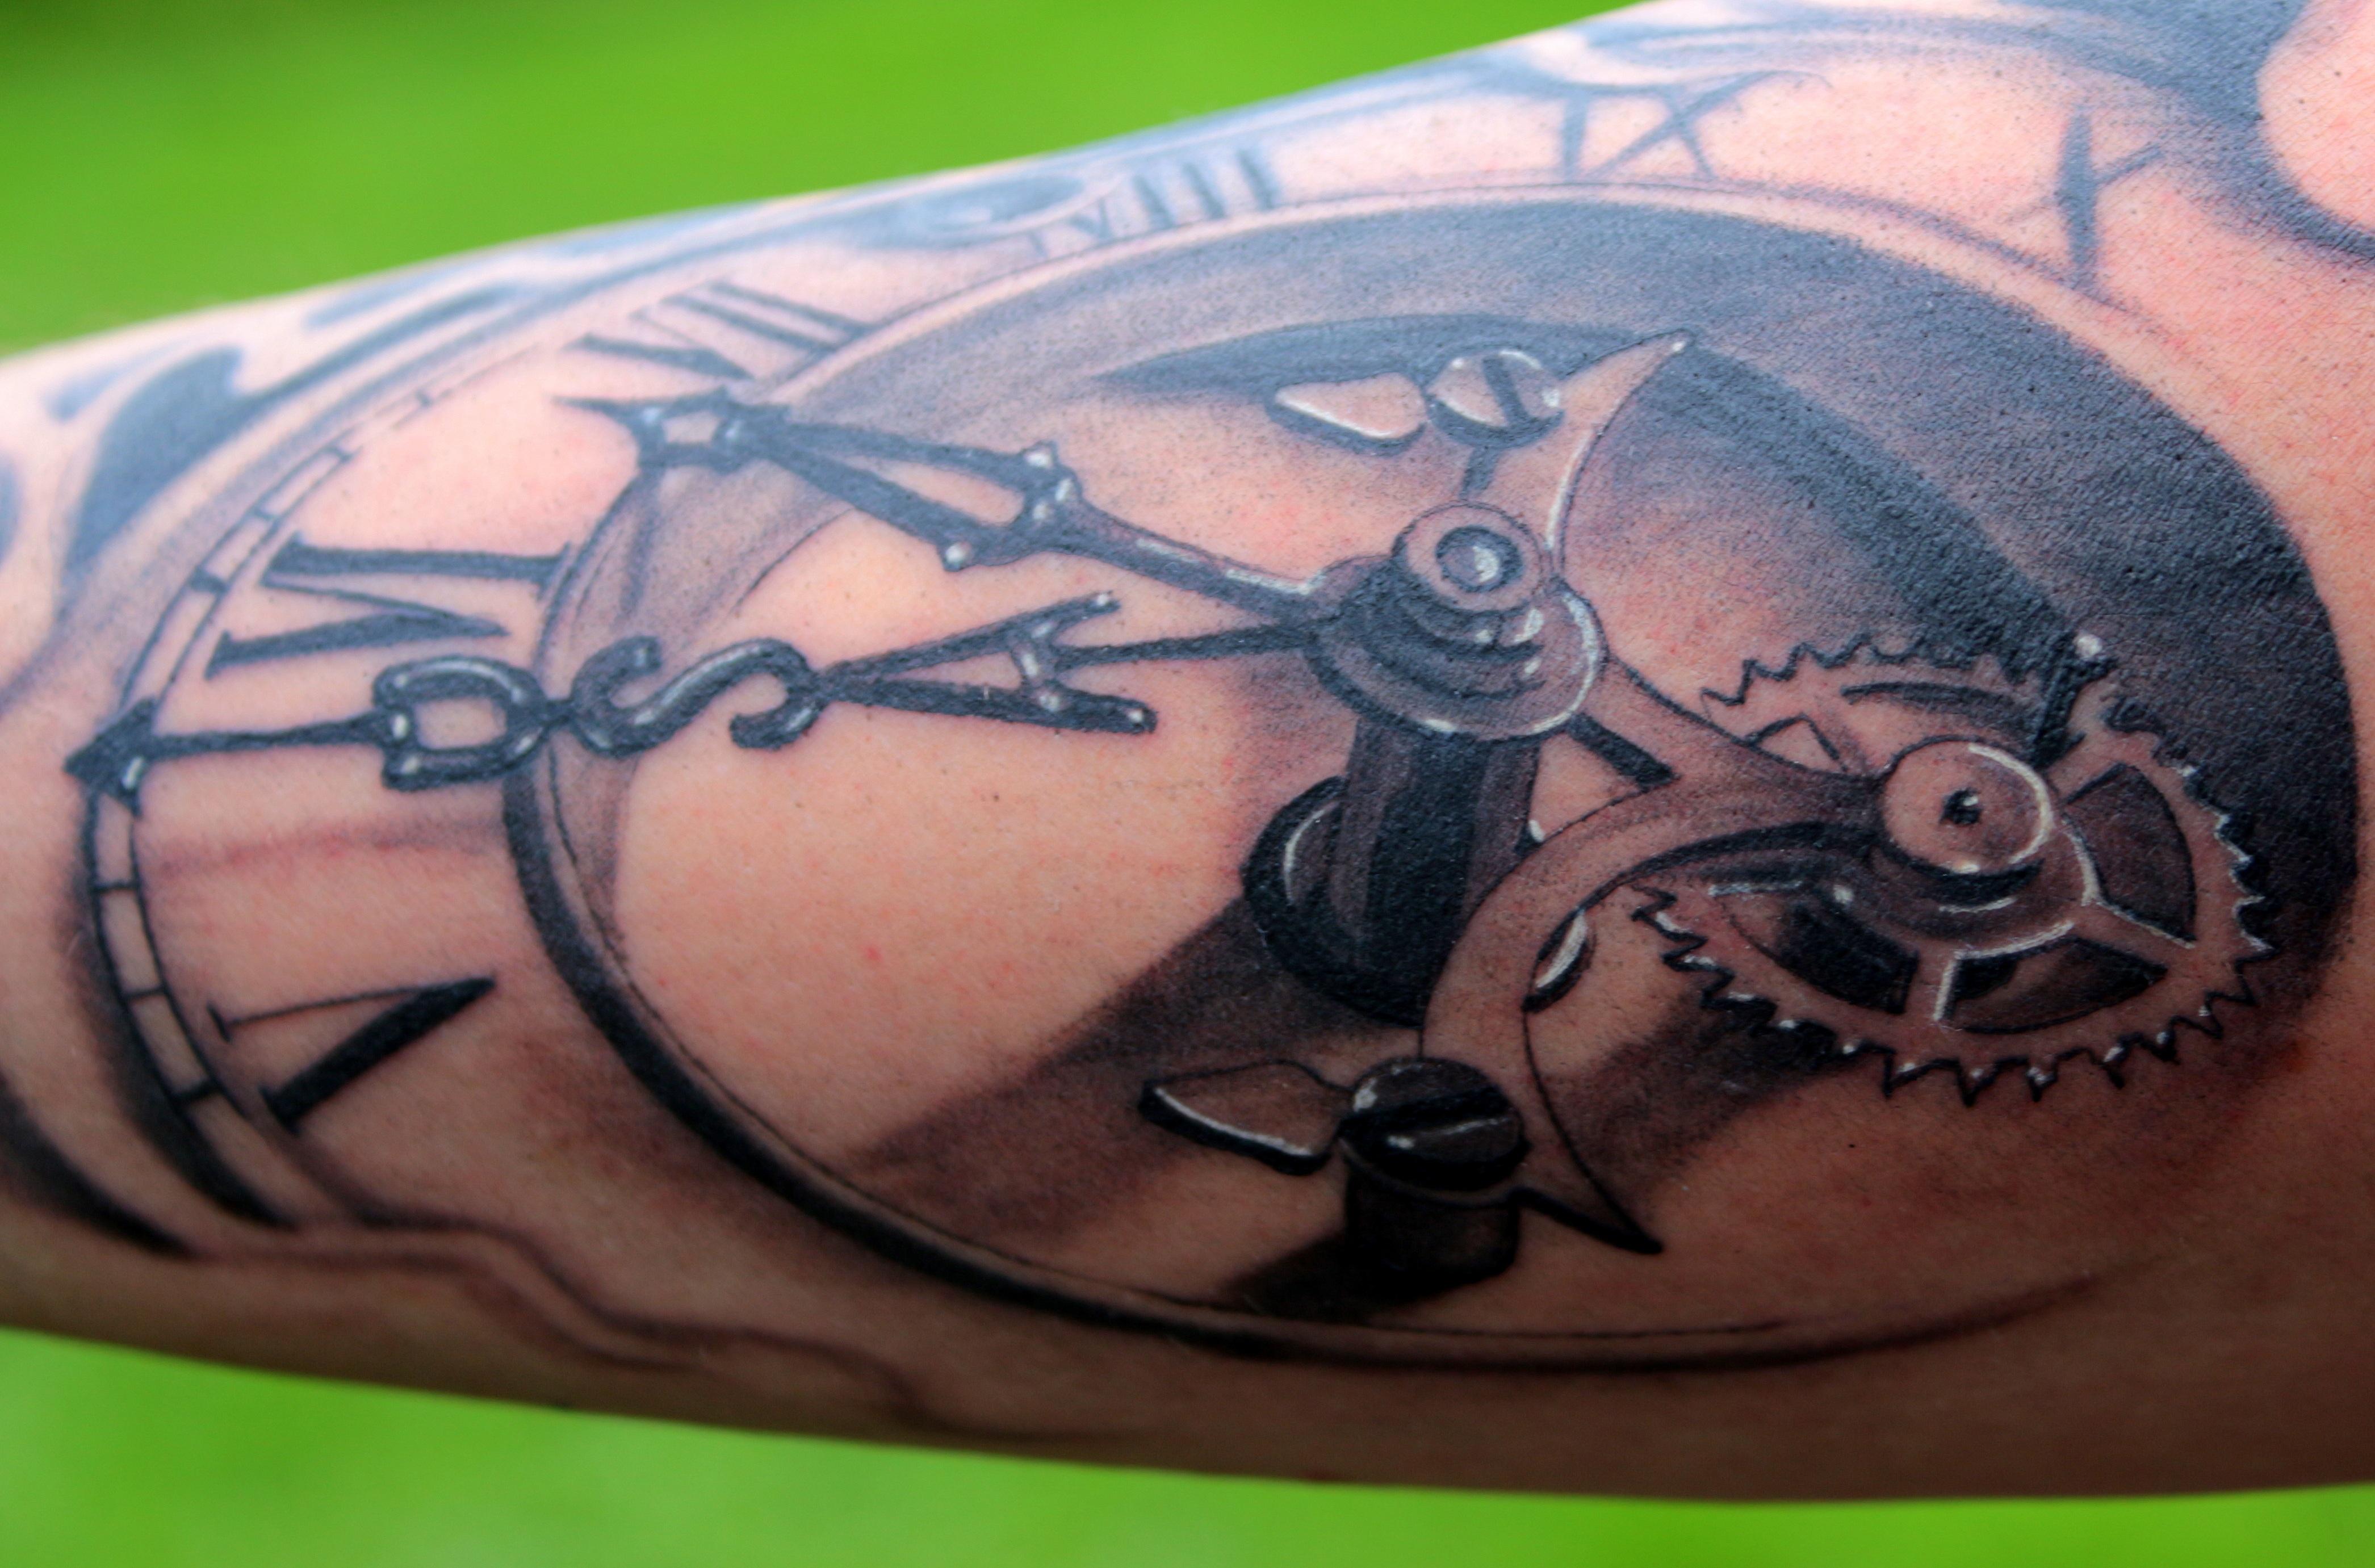 images gratuites l 39 horloge symbole tatouage quipement cadran poitrine encre corps. Black Bedroom Furniture Sets. Home Design Ideas